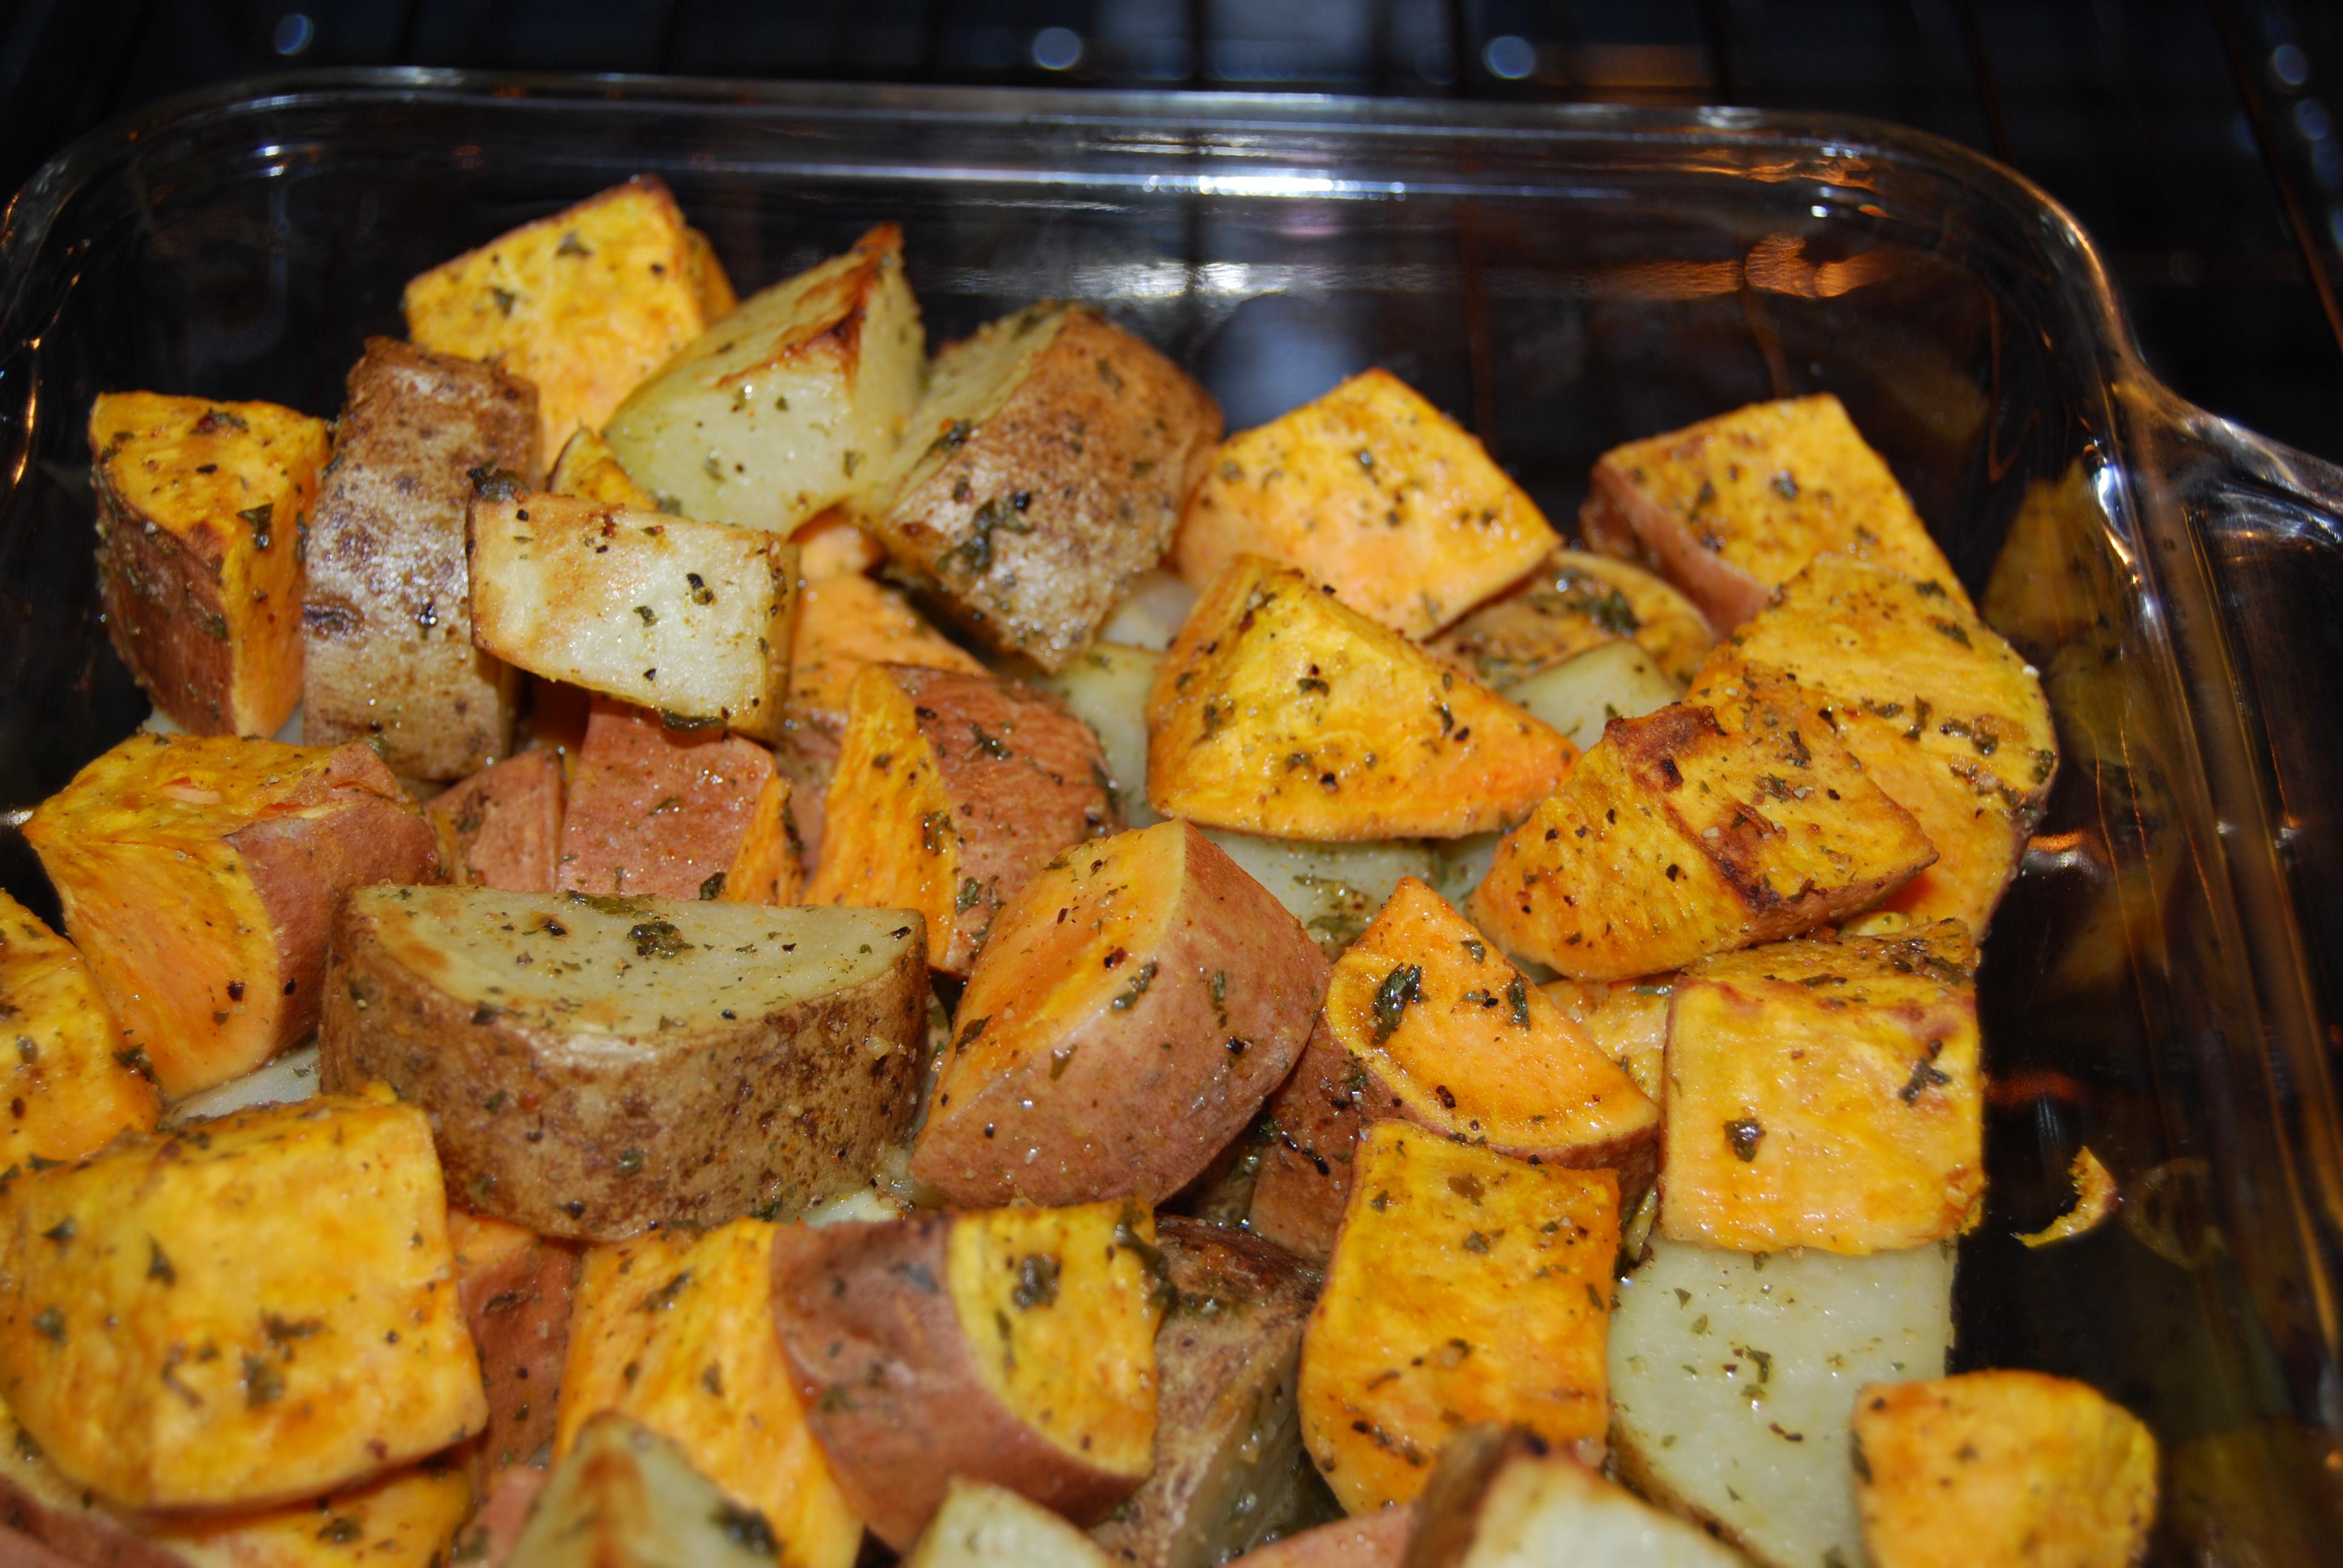 Roasted Potatoes with Sweet Potatoes